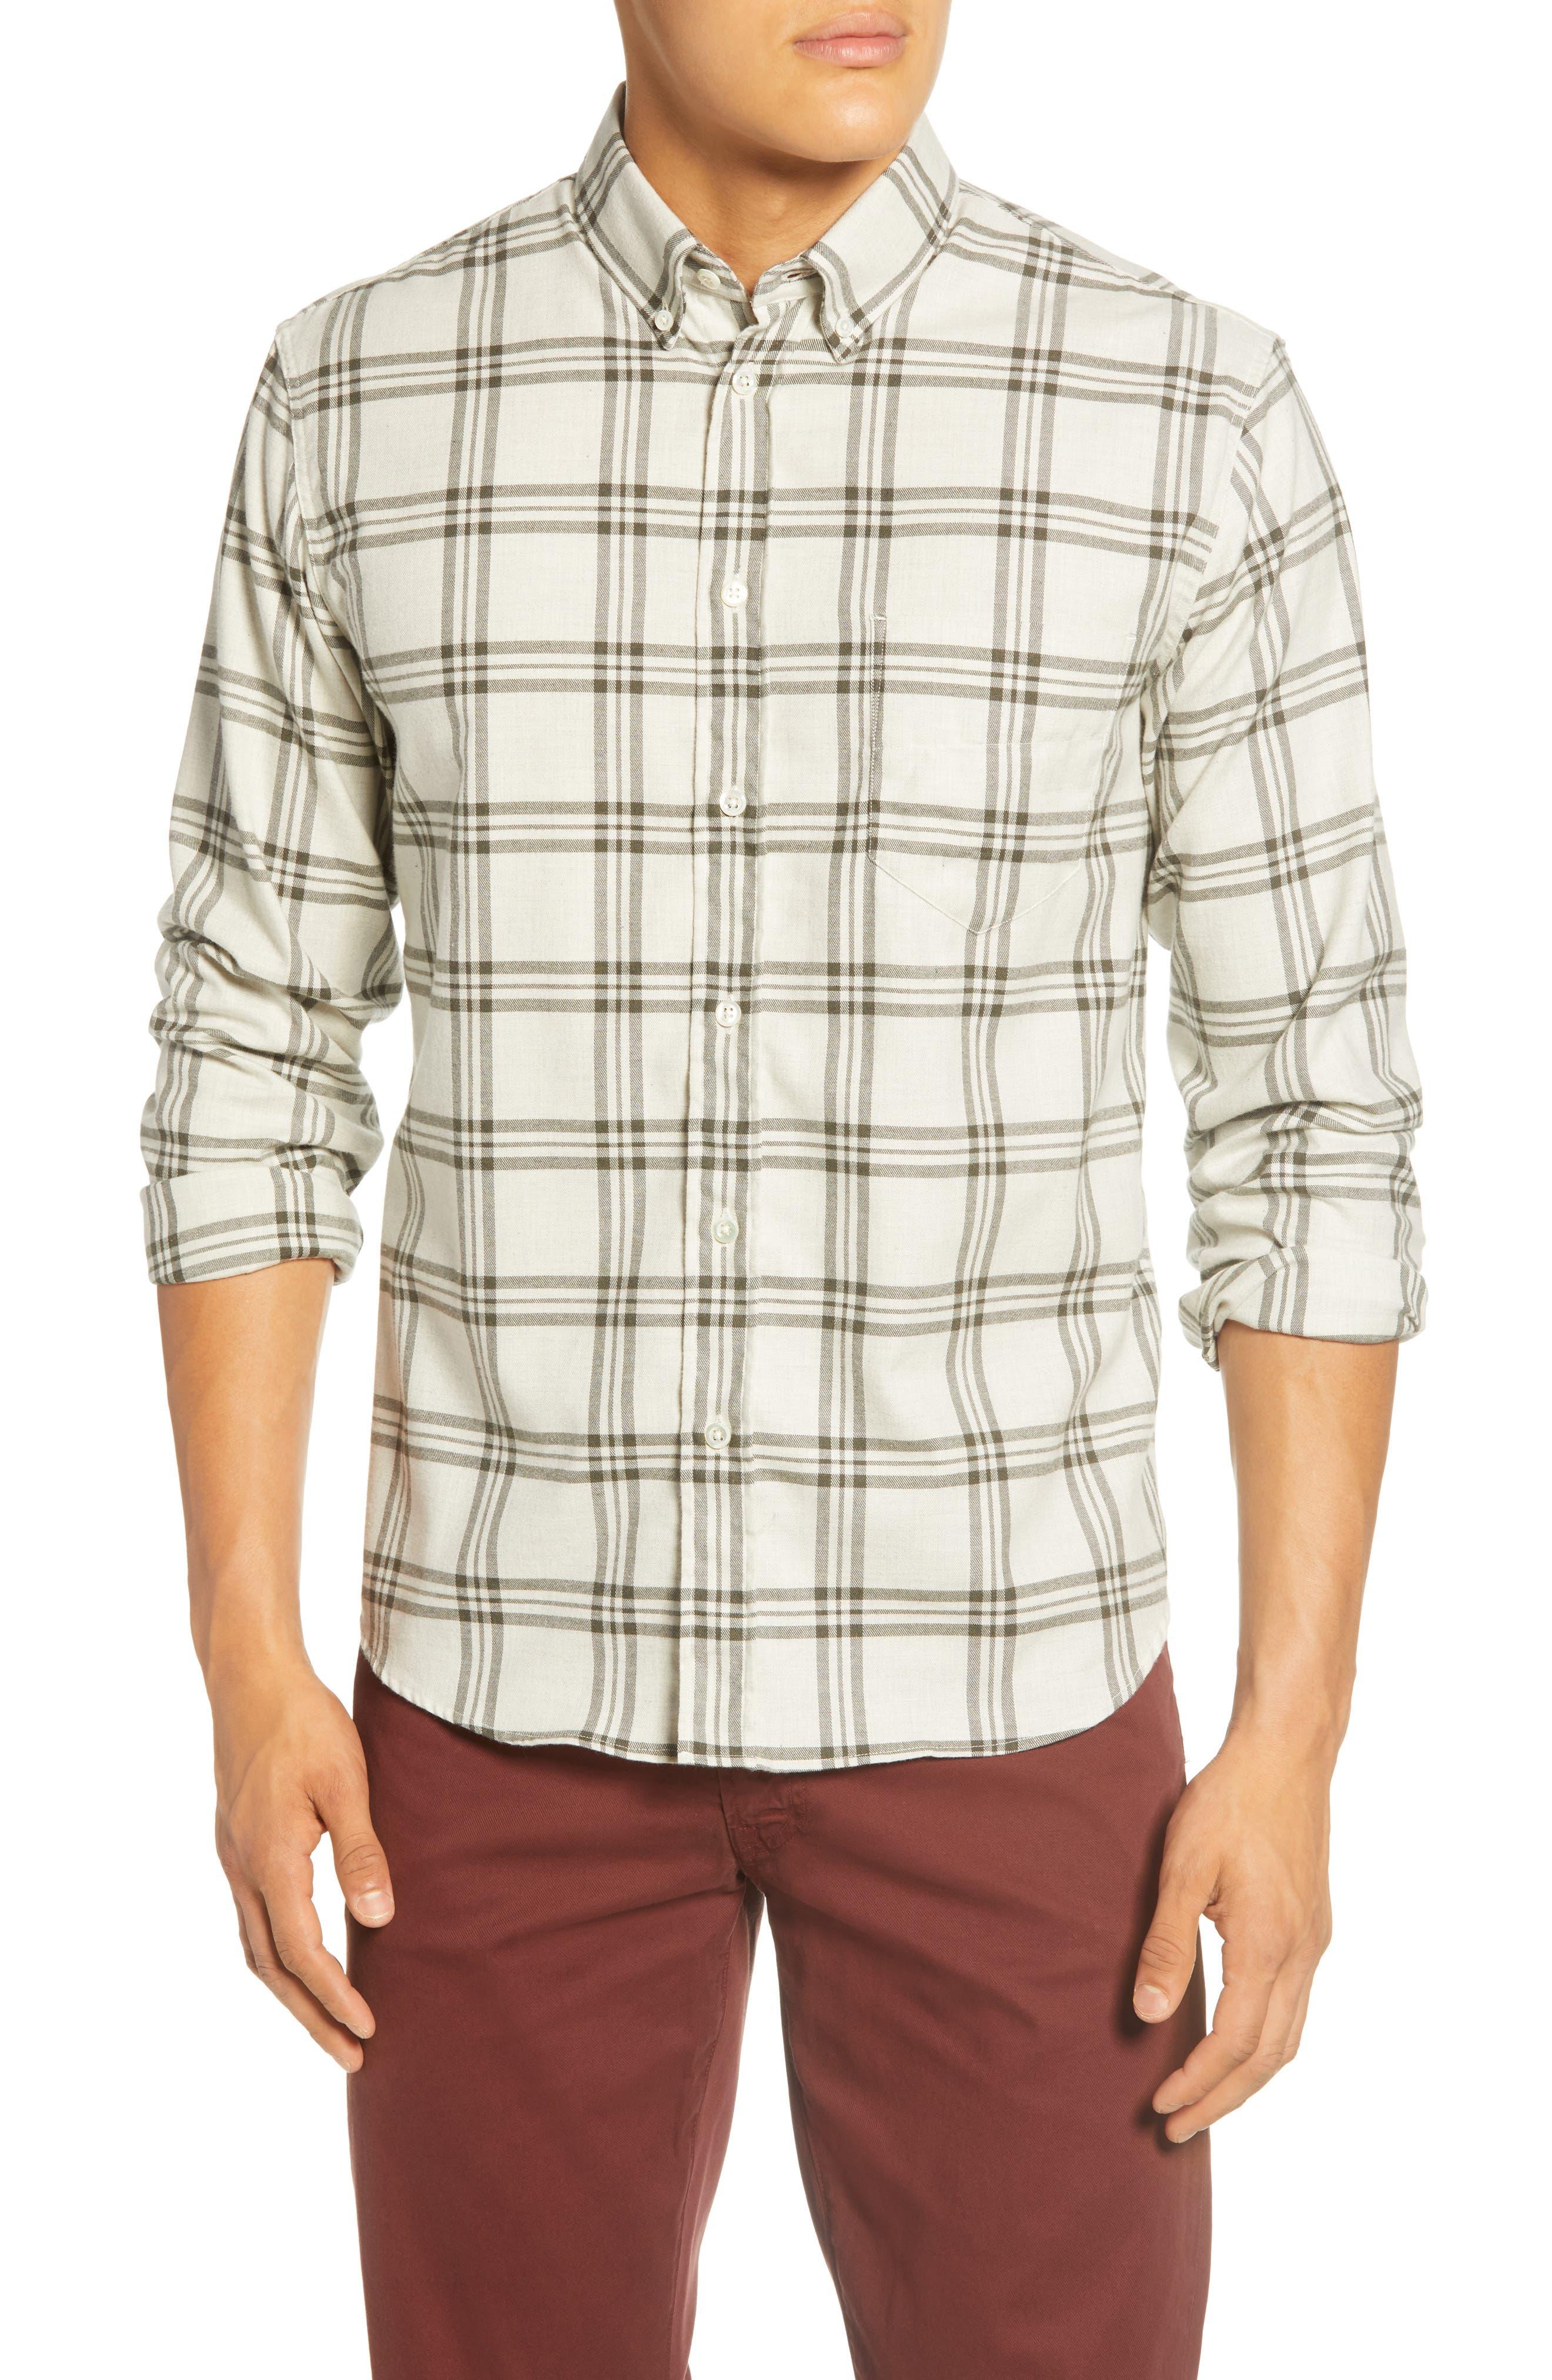 Image of Billy Reid Plaid Regular Fit Cotton Shirt